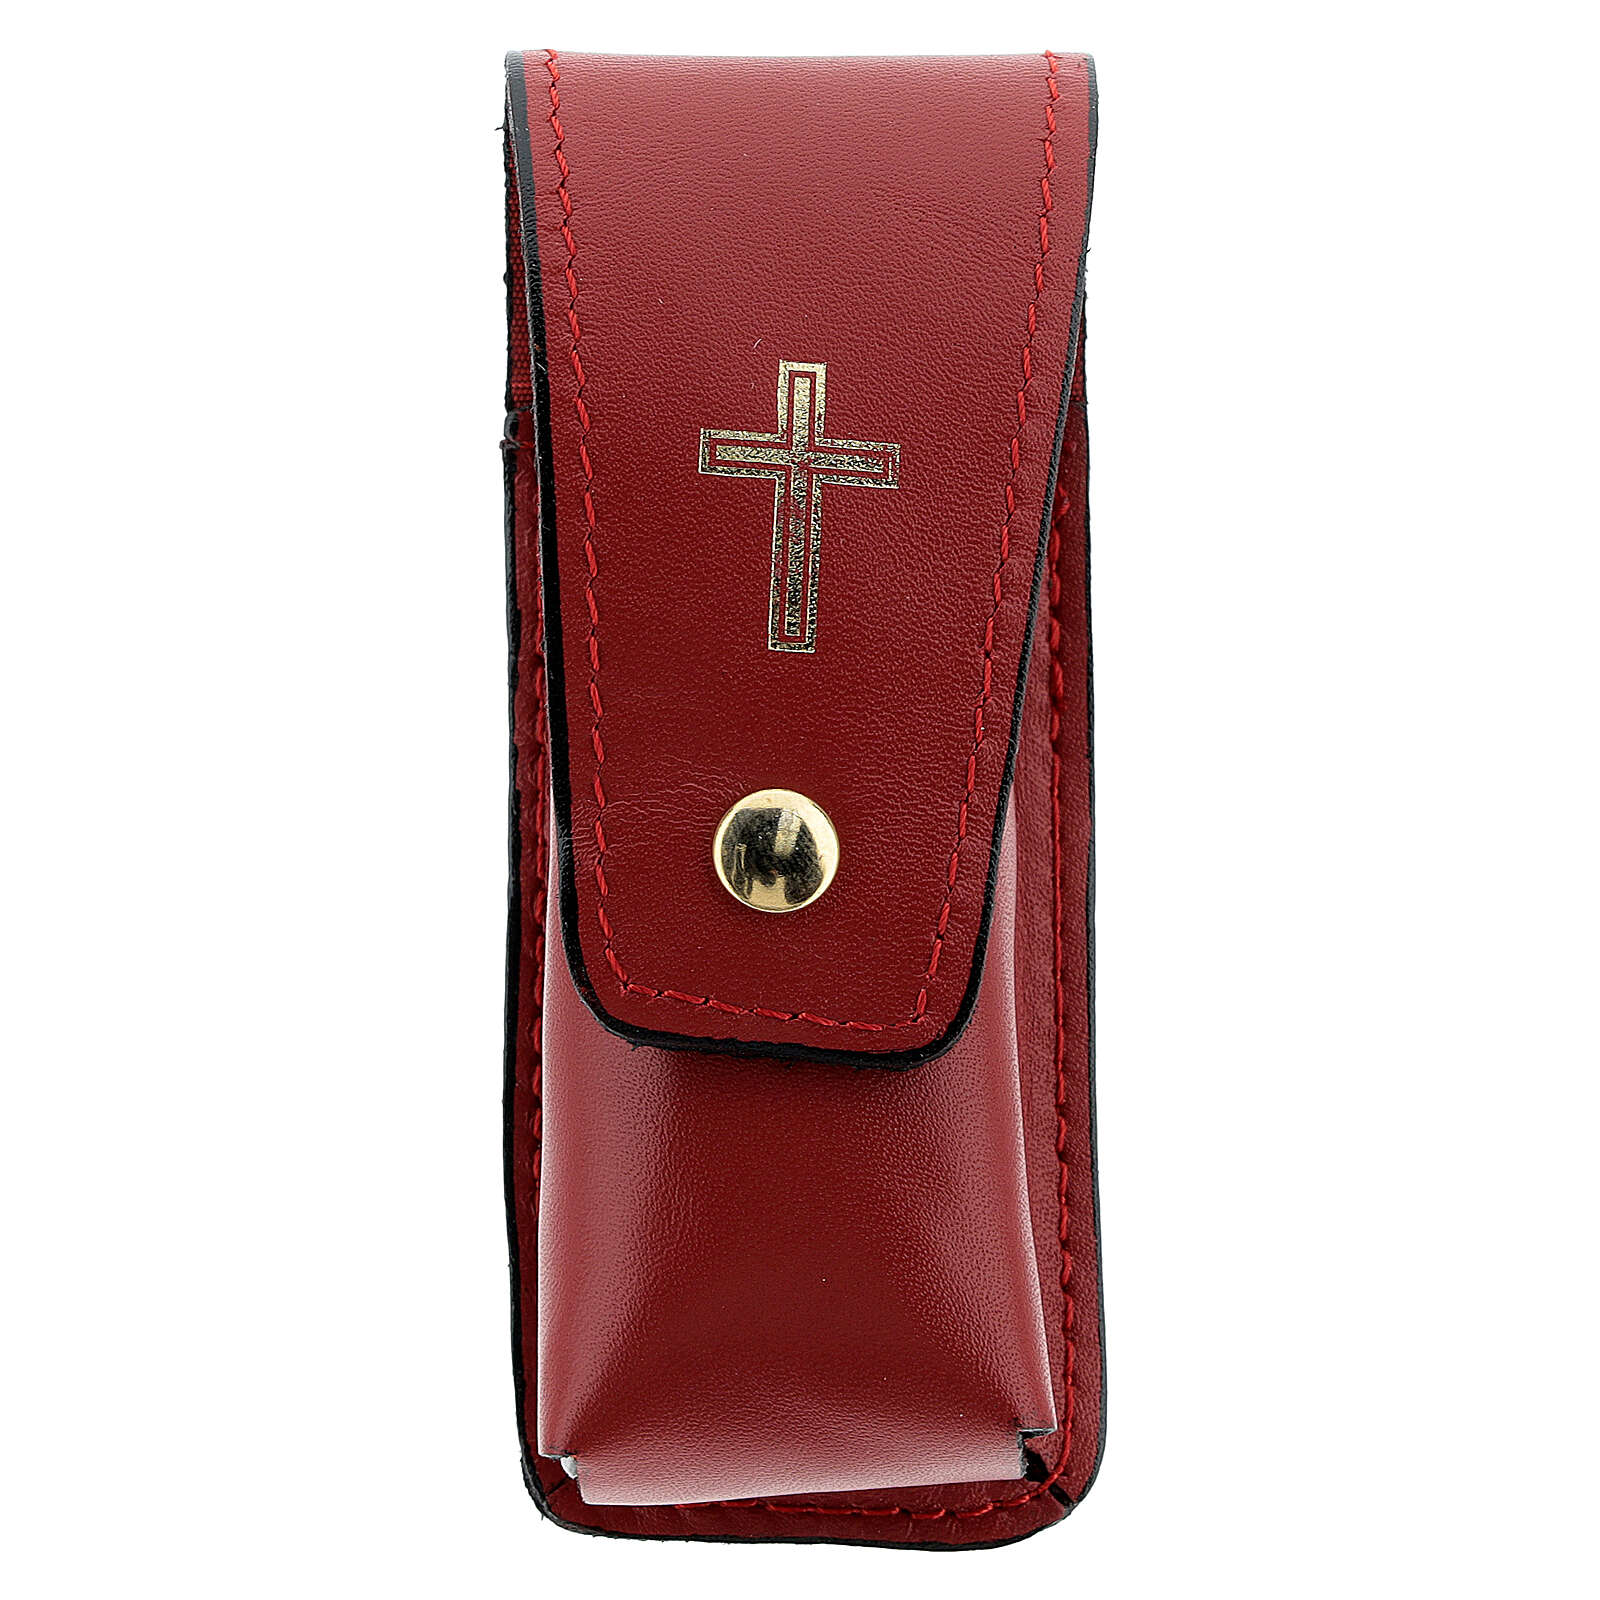 Sprinkler case 3 1/2 in real red leather 3